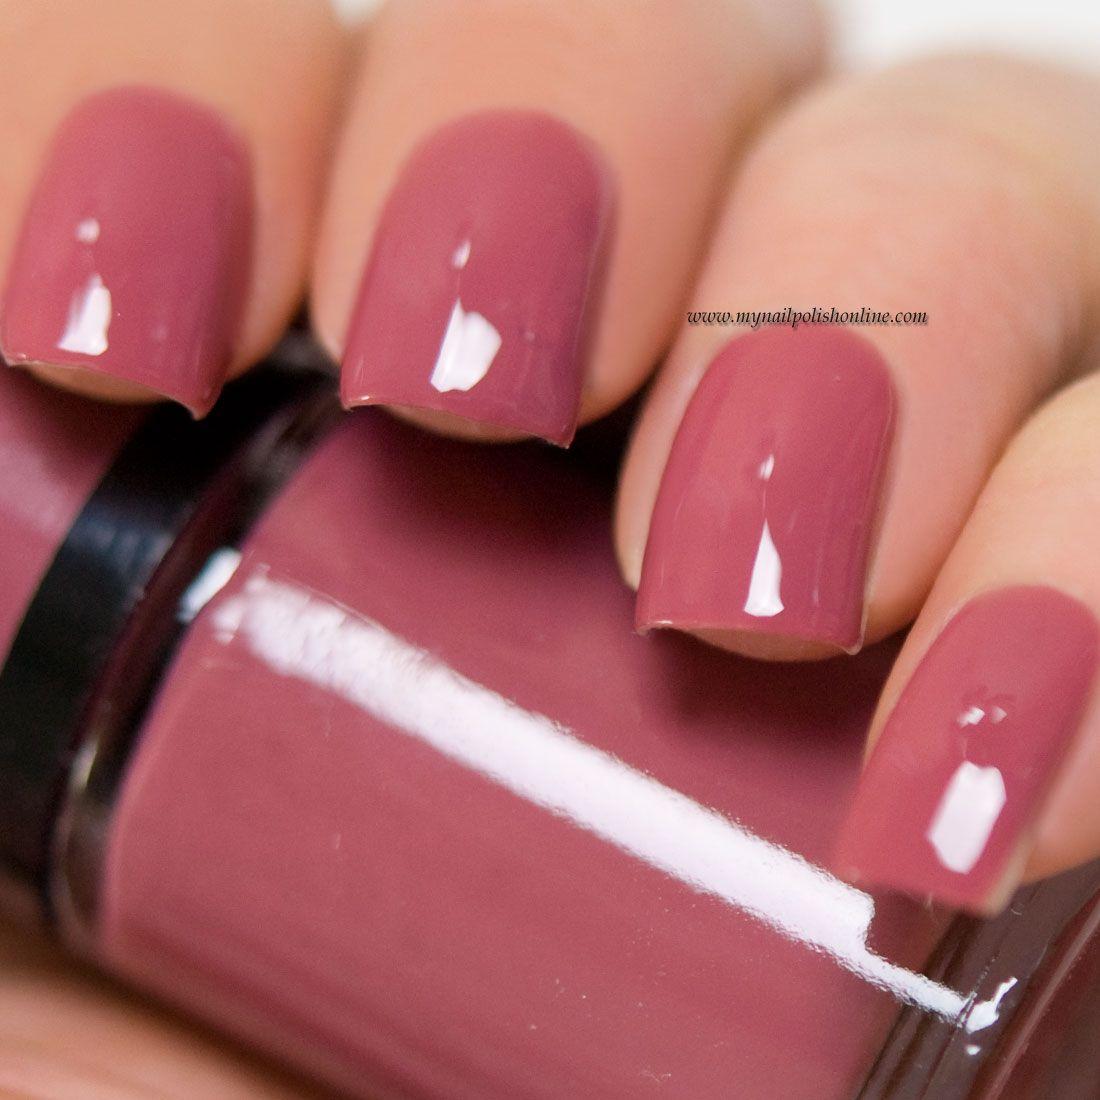 Maybelline - Smoky Rose | Nails | Nails, Maybelline nail polish ...